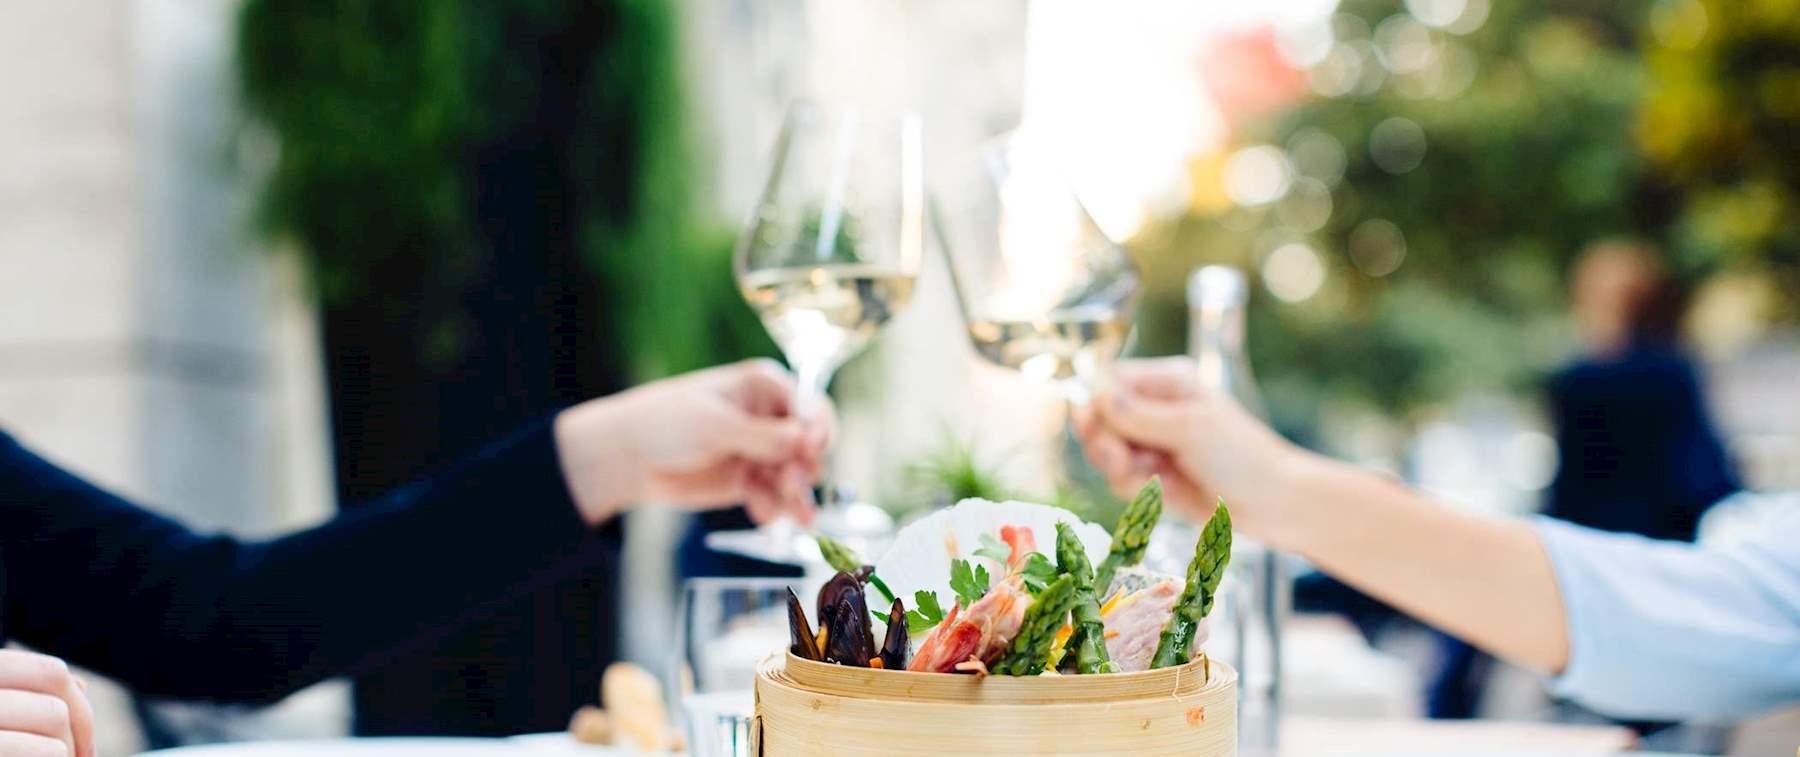 Doney Restaurant & Café Contact Us